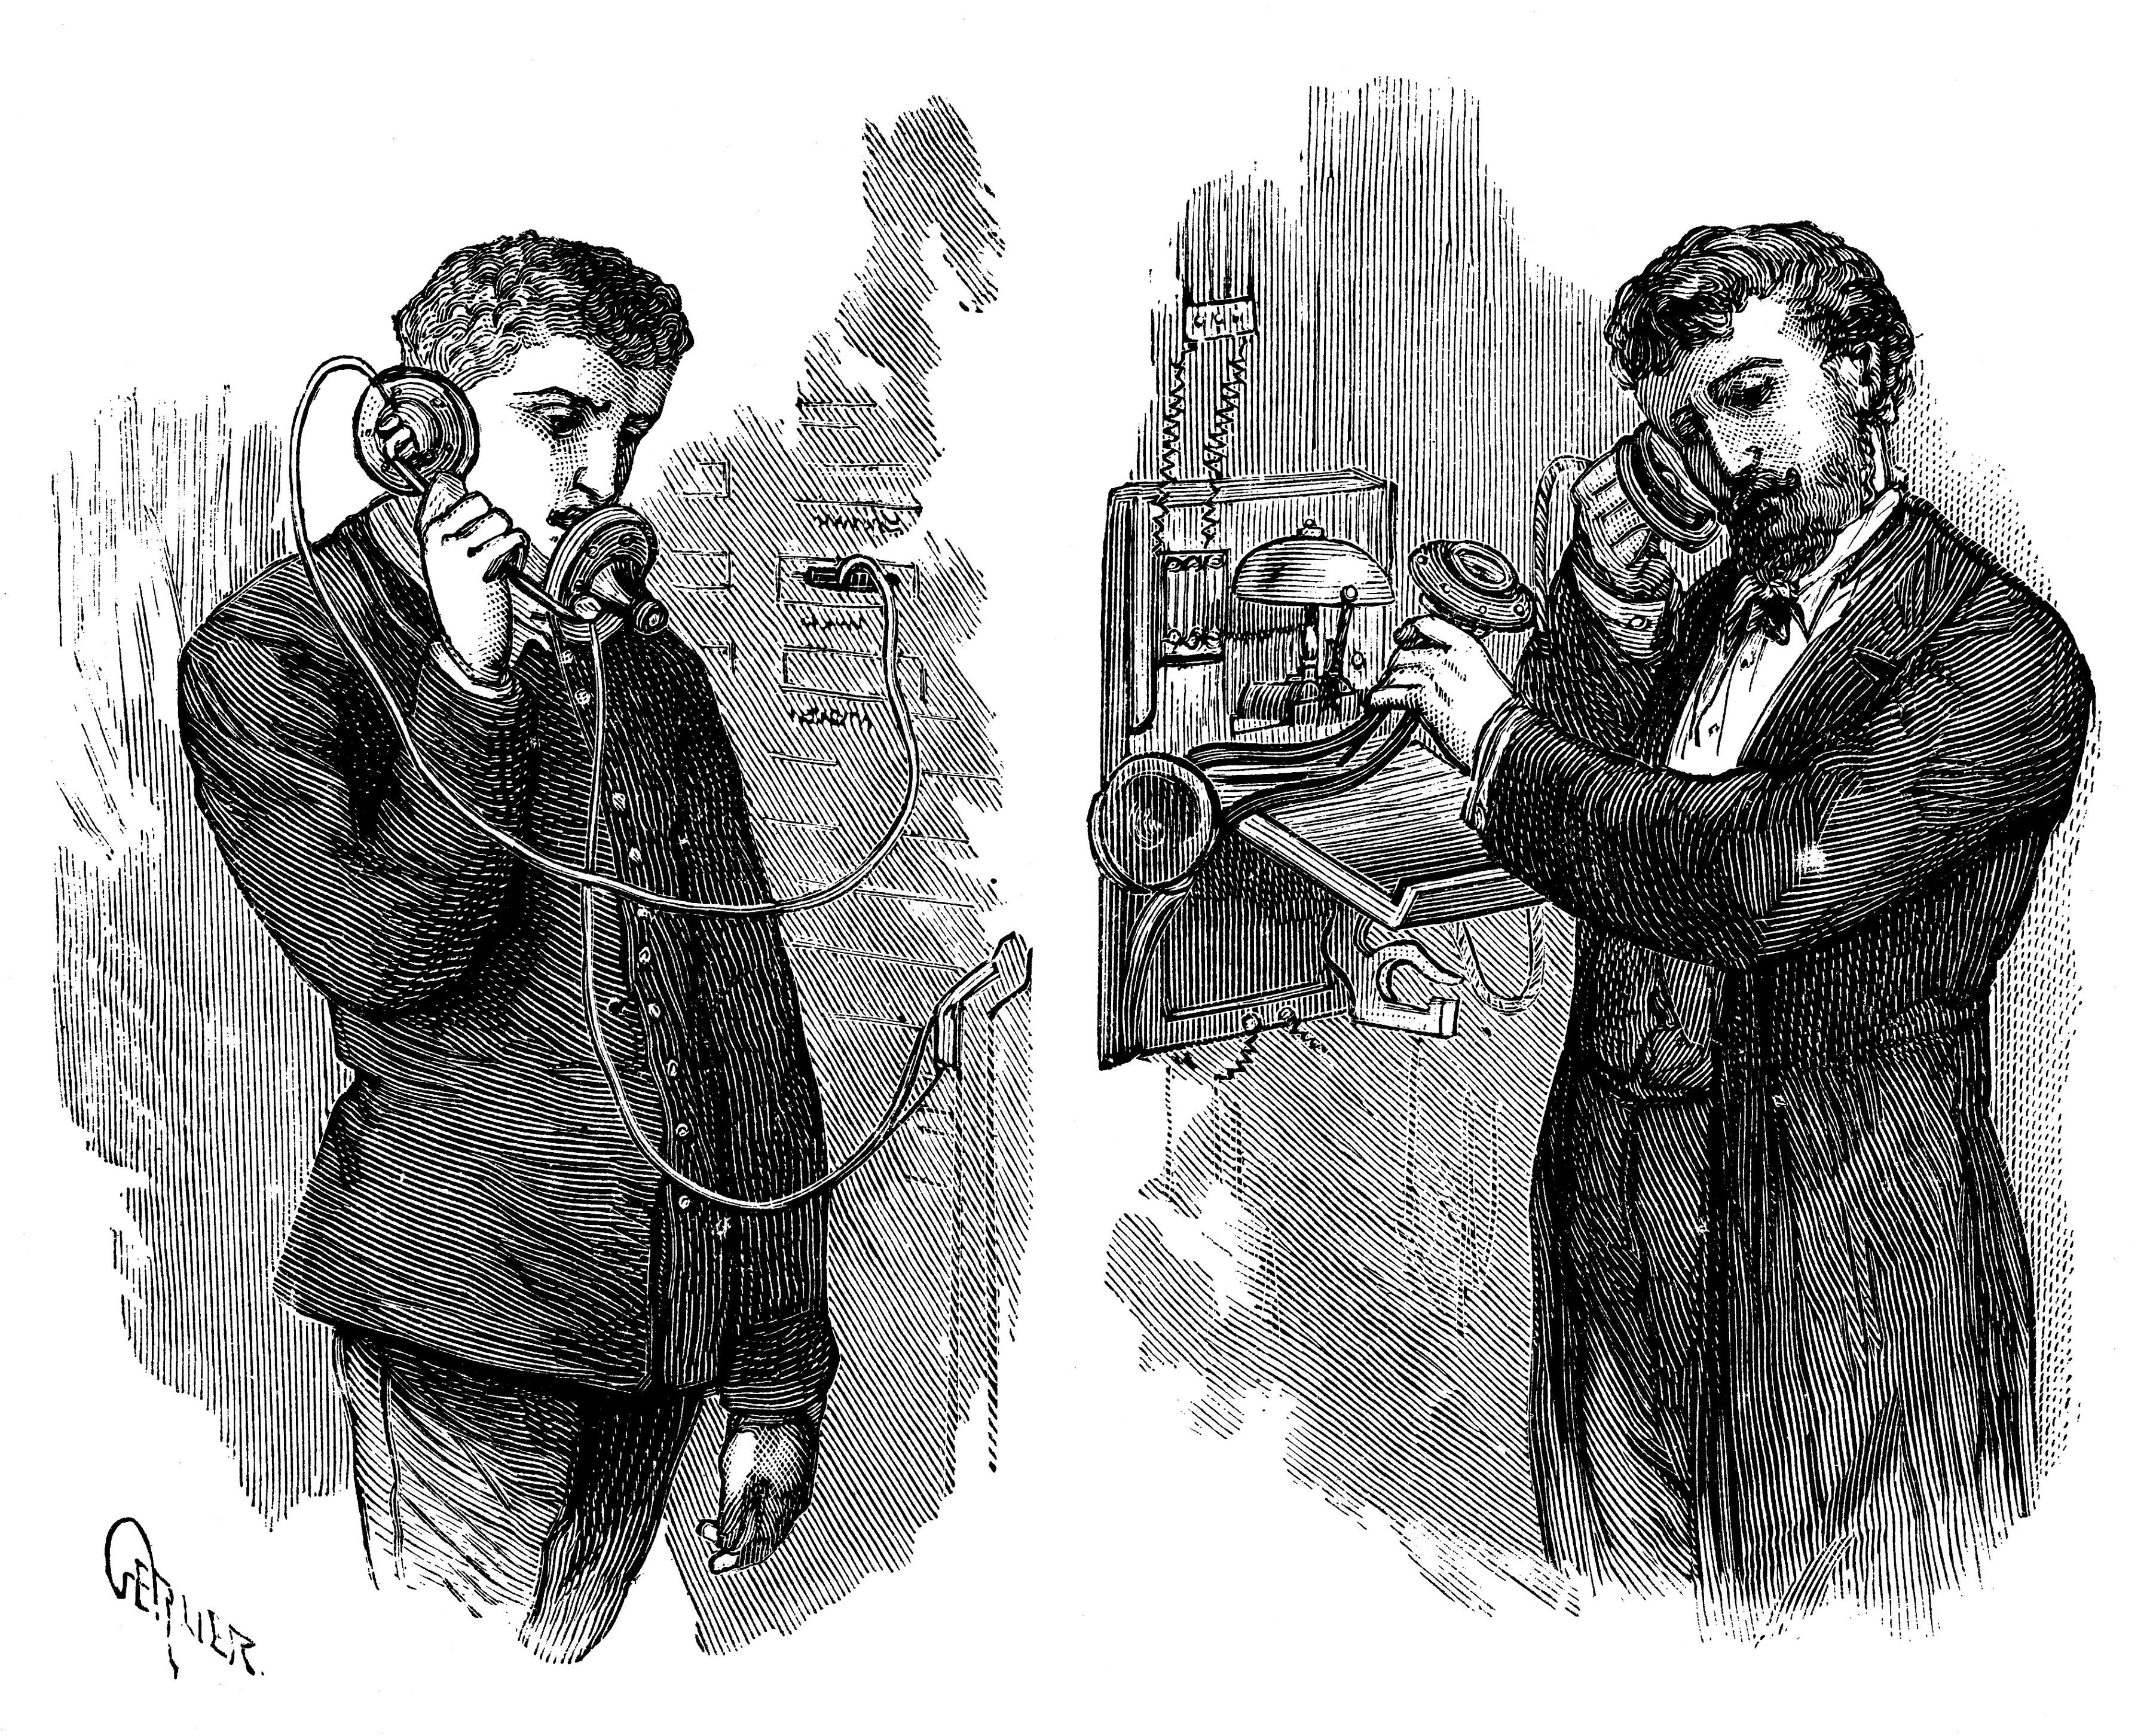 New York telephone subscriber making call through operator at telephone exchange, 1883.